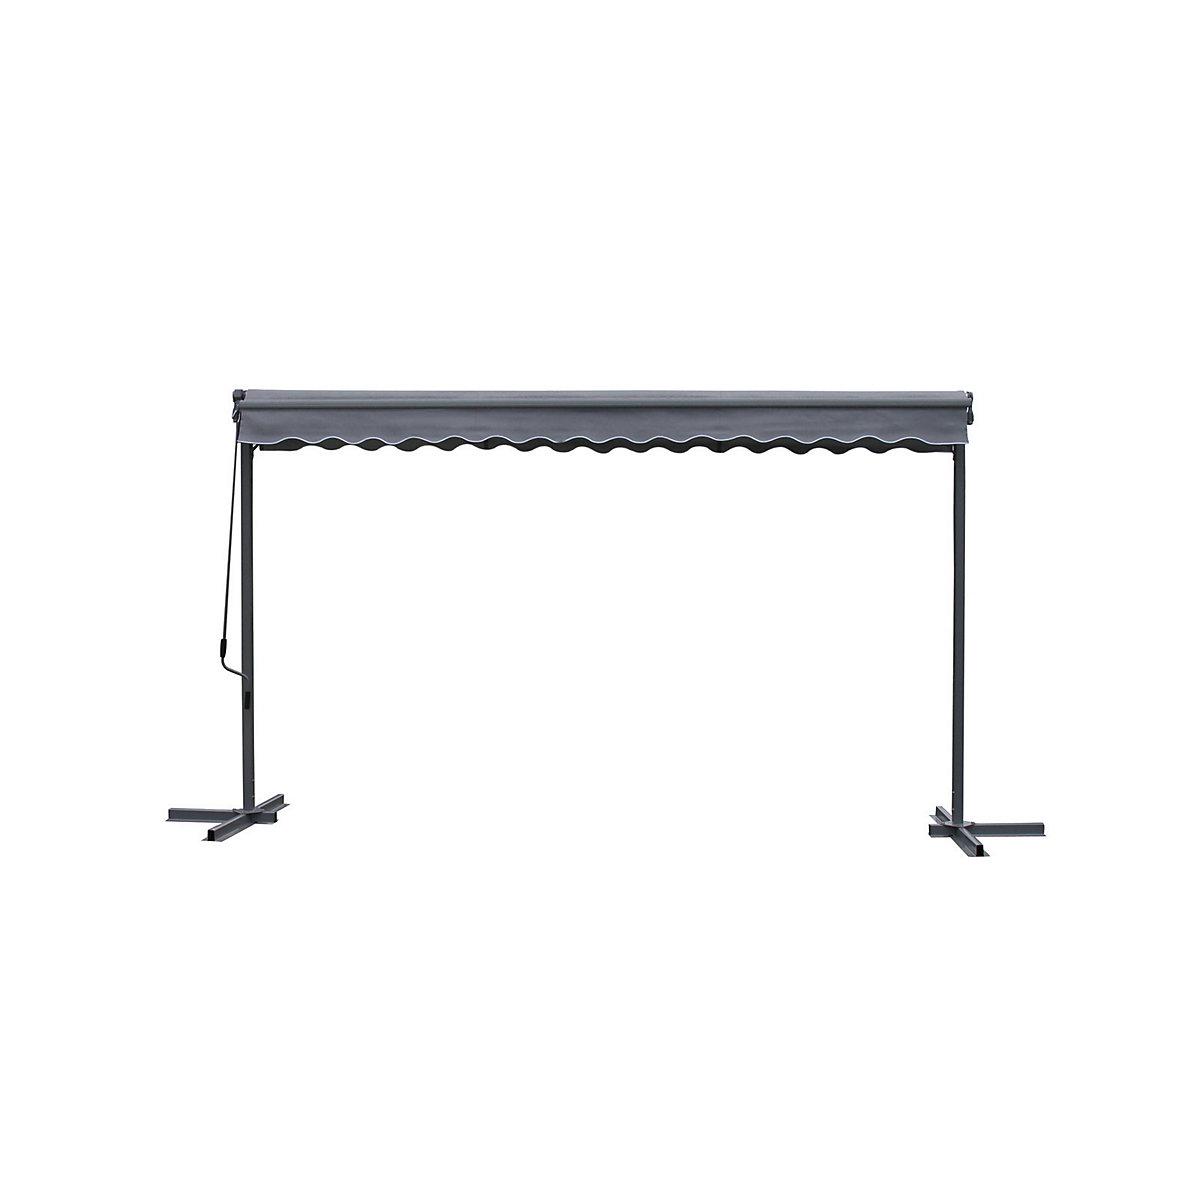 grasekamp schutzh lle 4 meter f r stand markise london terrassen berdachung mobile markise wei. Black Bedroom Furniture Sets. Home Design Ideas